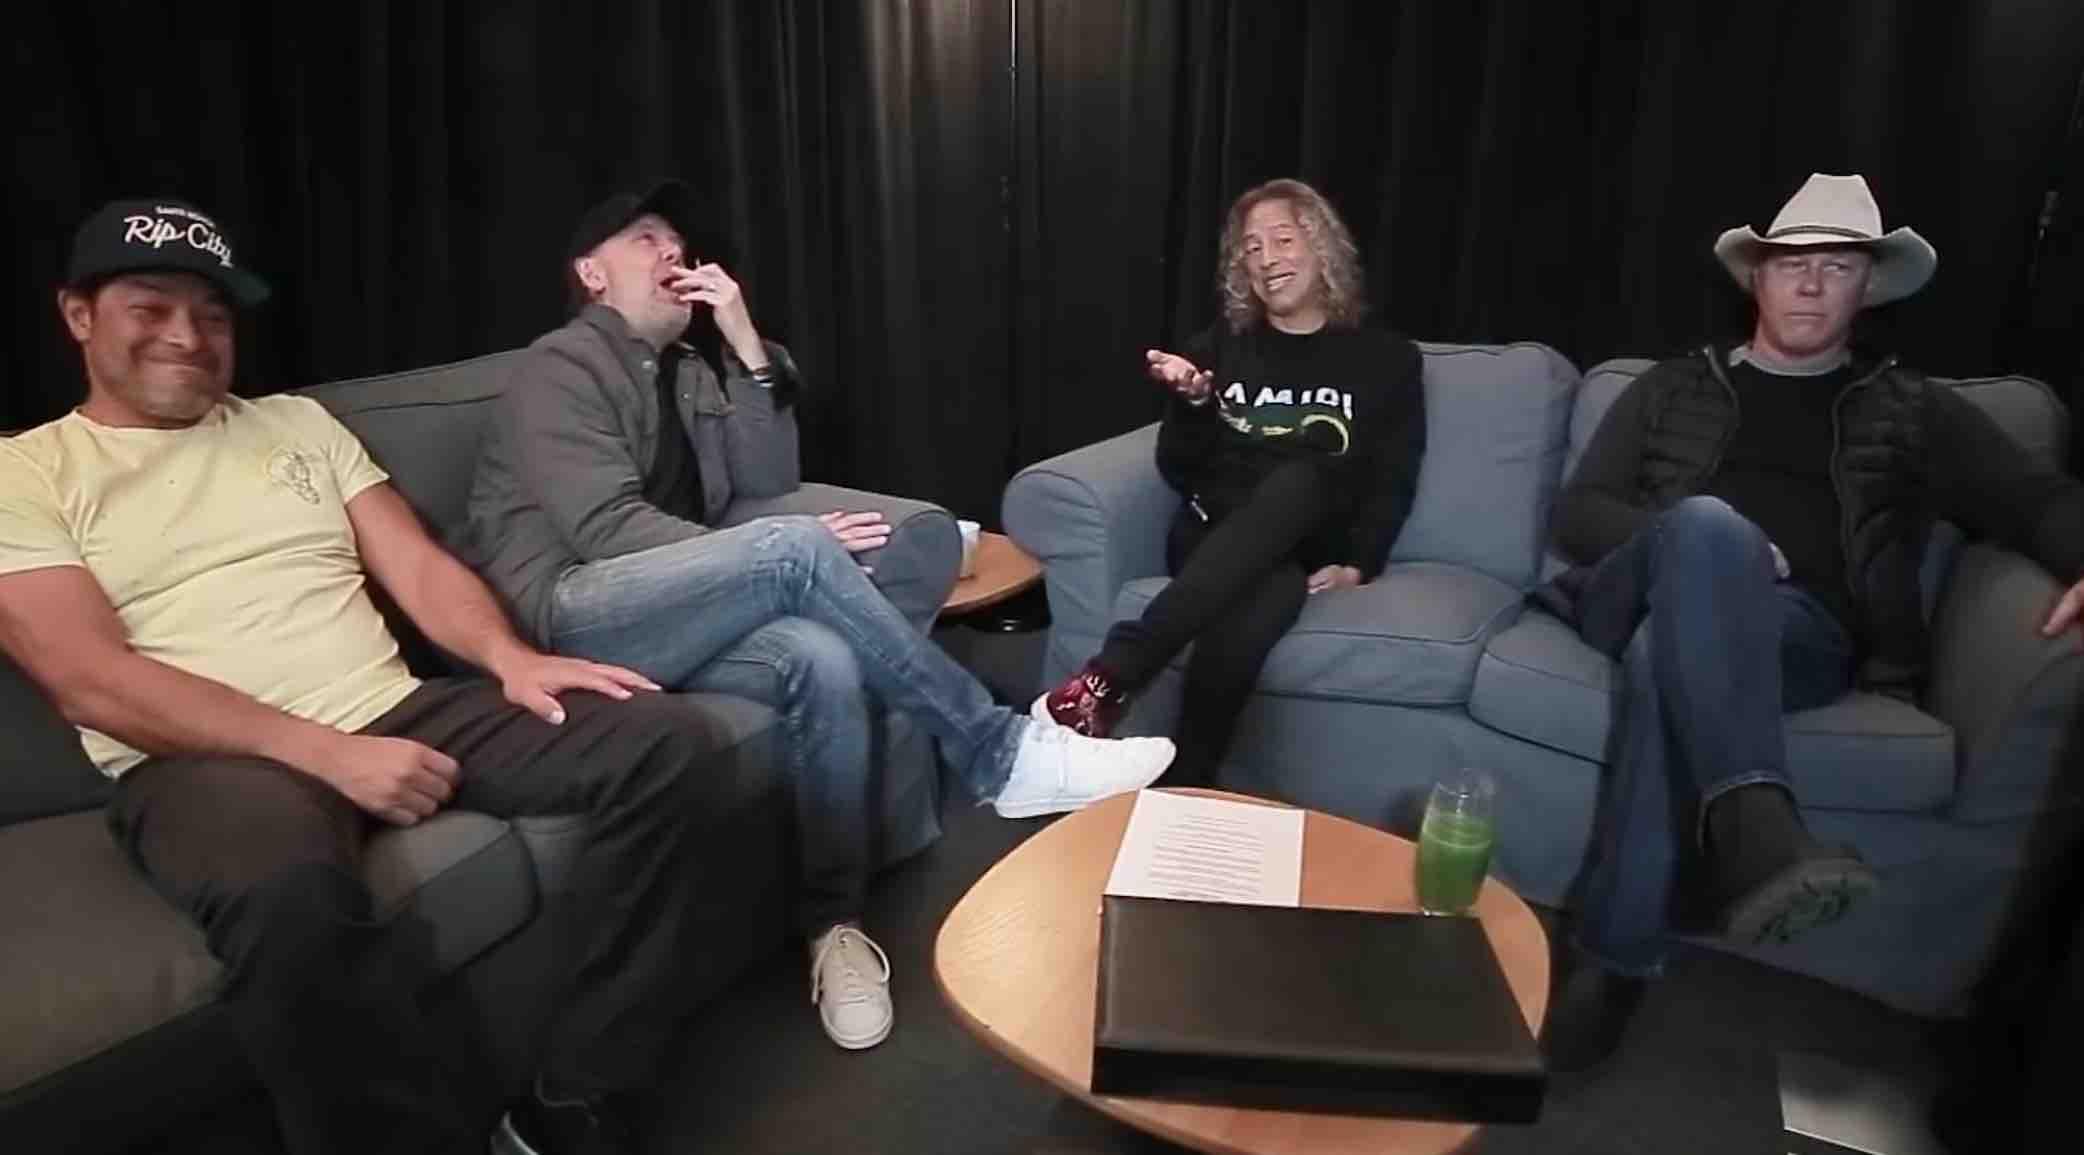 Lars Ulrich Describes 'Fear' For Metallica Heading Into 2019